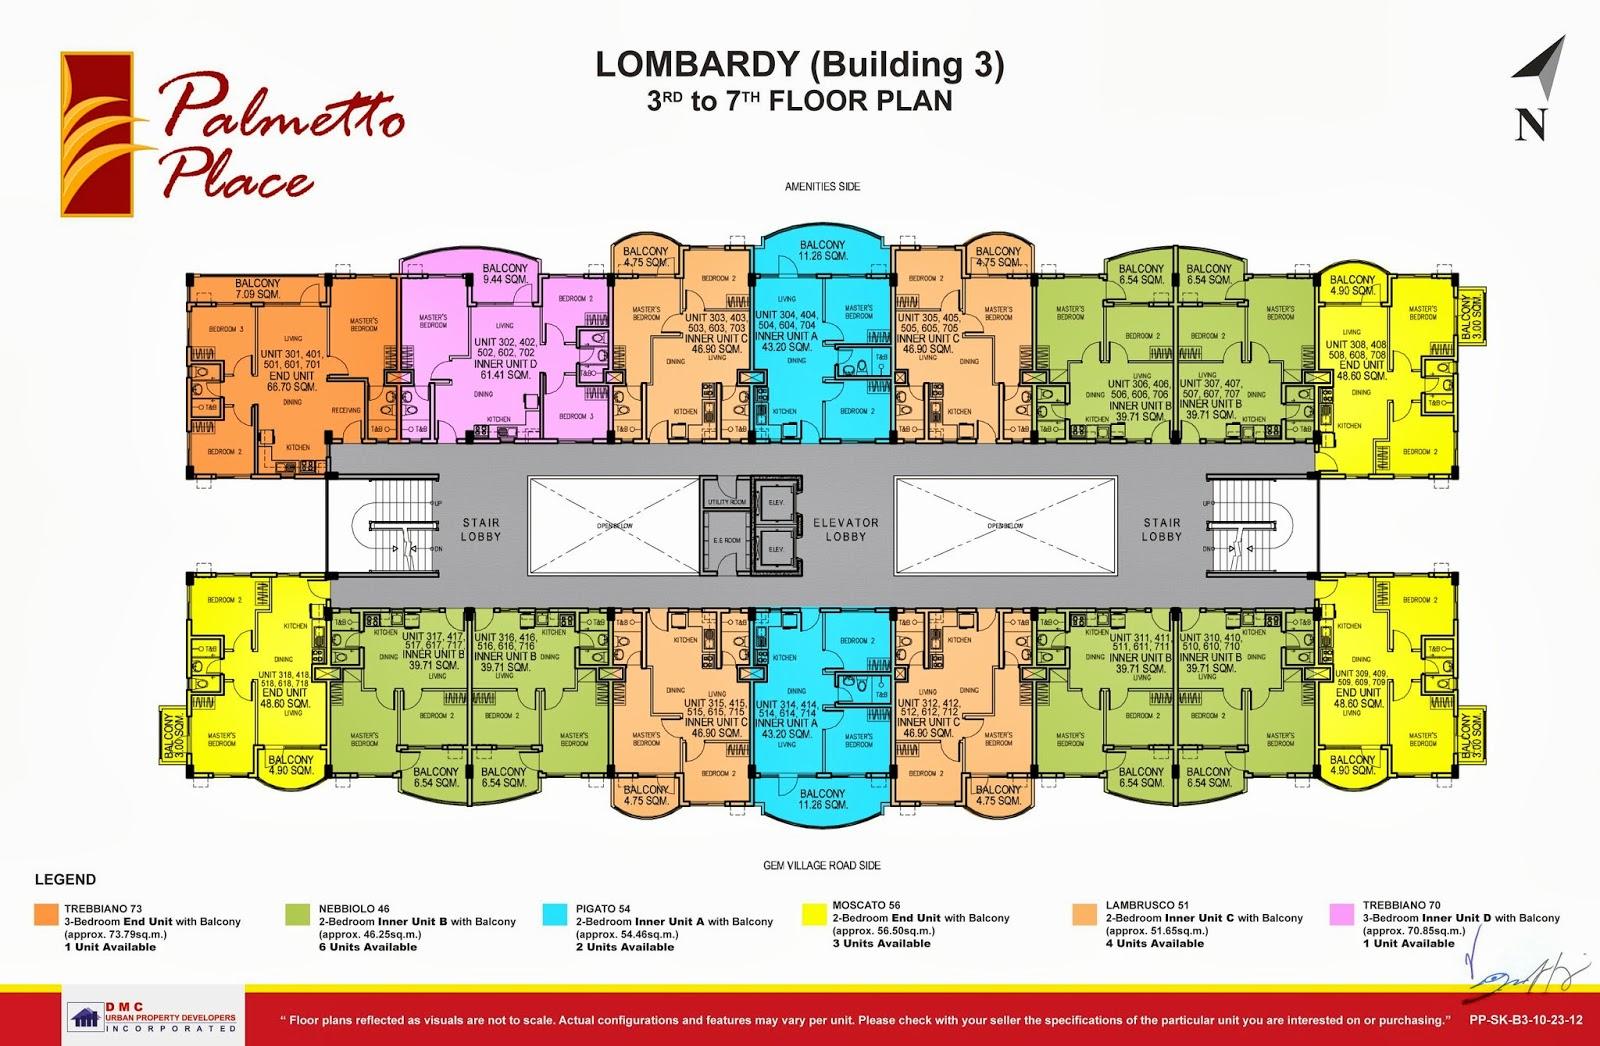 Palmetto Place Condominium, Ma-a, Davao City 3rd-7th Floor Plan